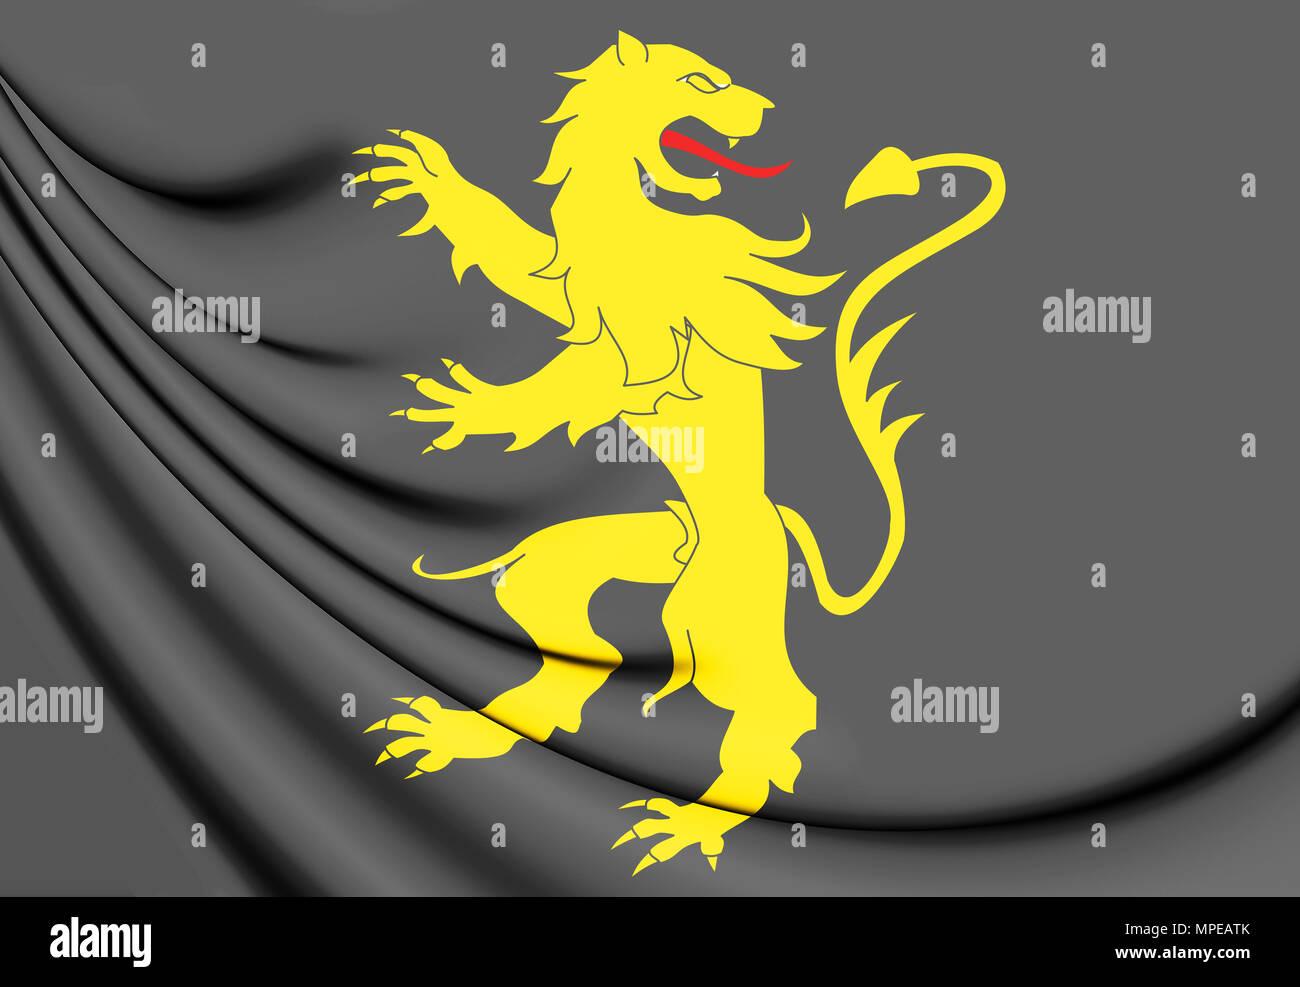 3D Flag of Ceredigion County, Wales. 3D Illustration. - Stock Image